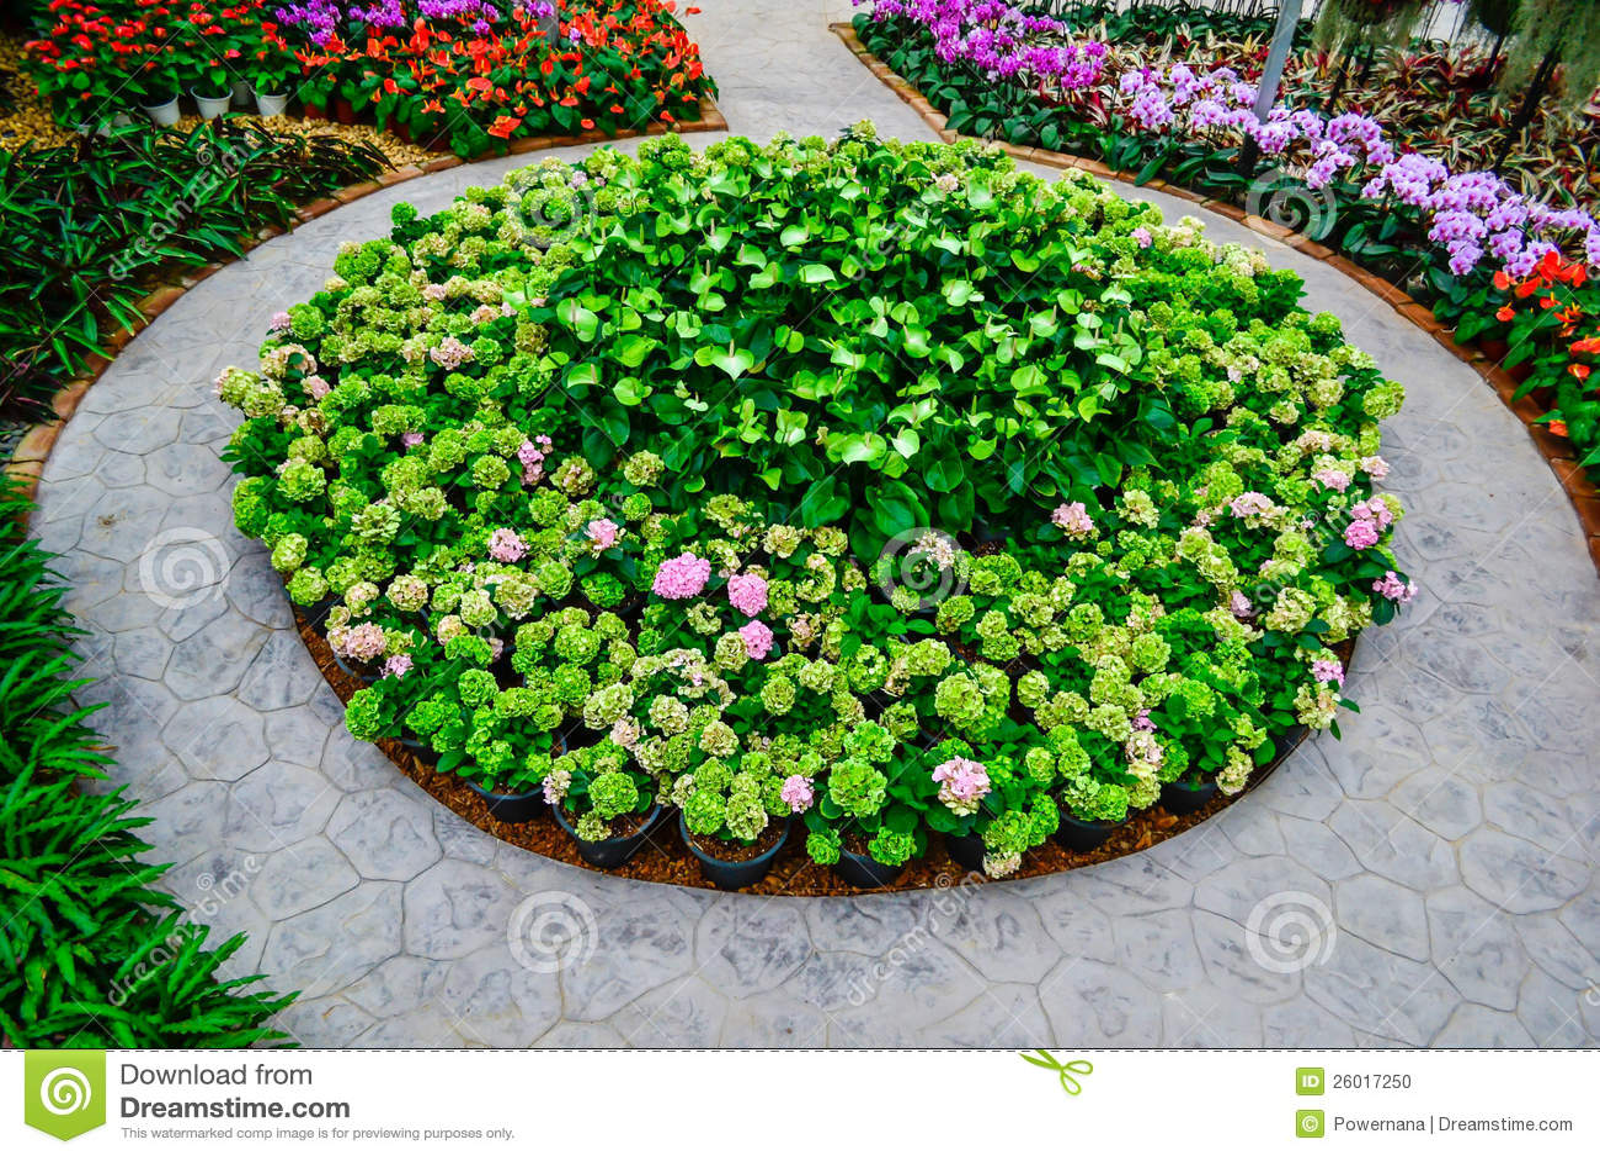 Flower Garden Stock Photo Image Of Pretty Greenery 26017250